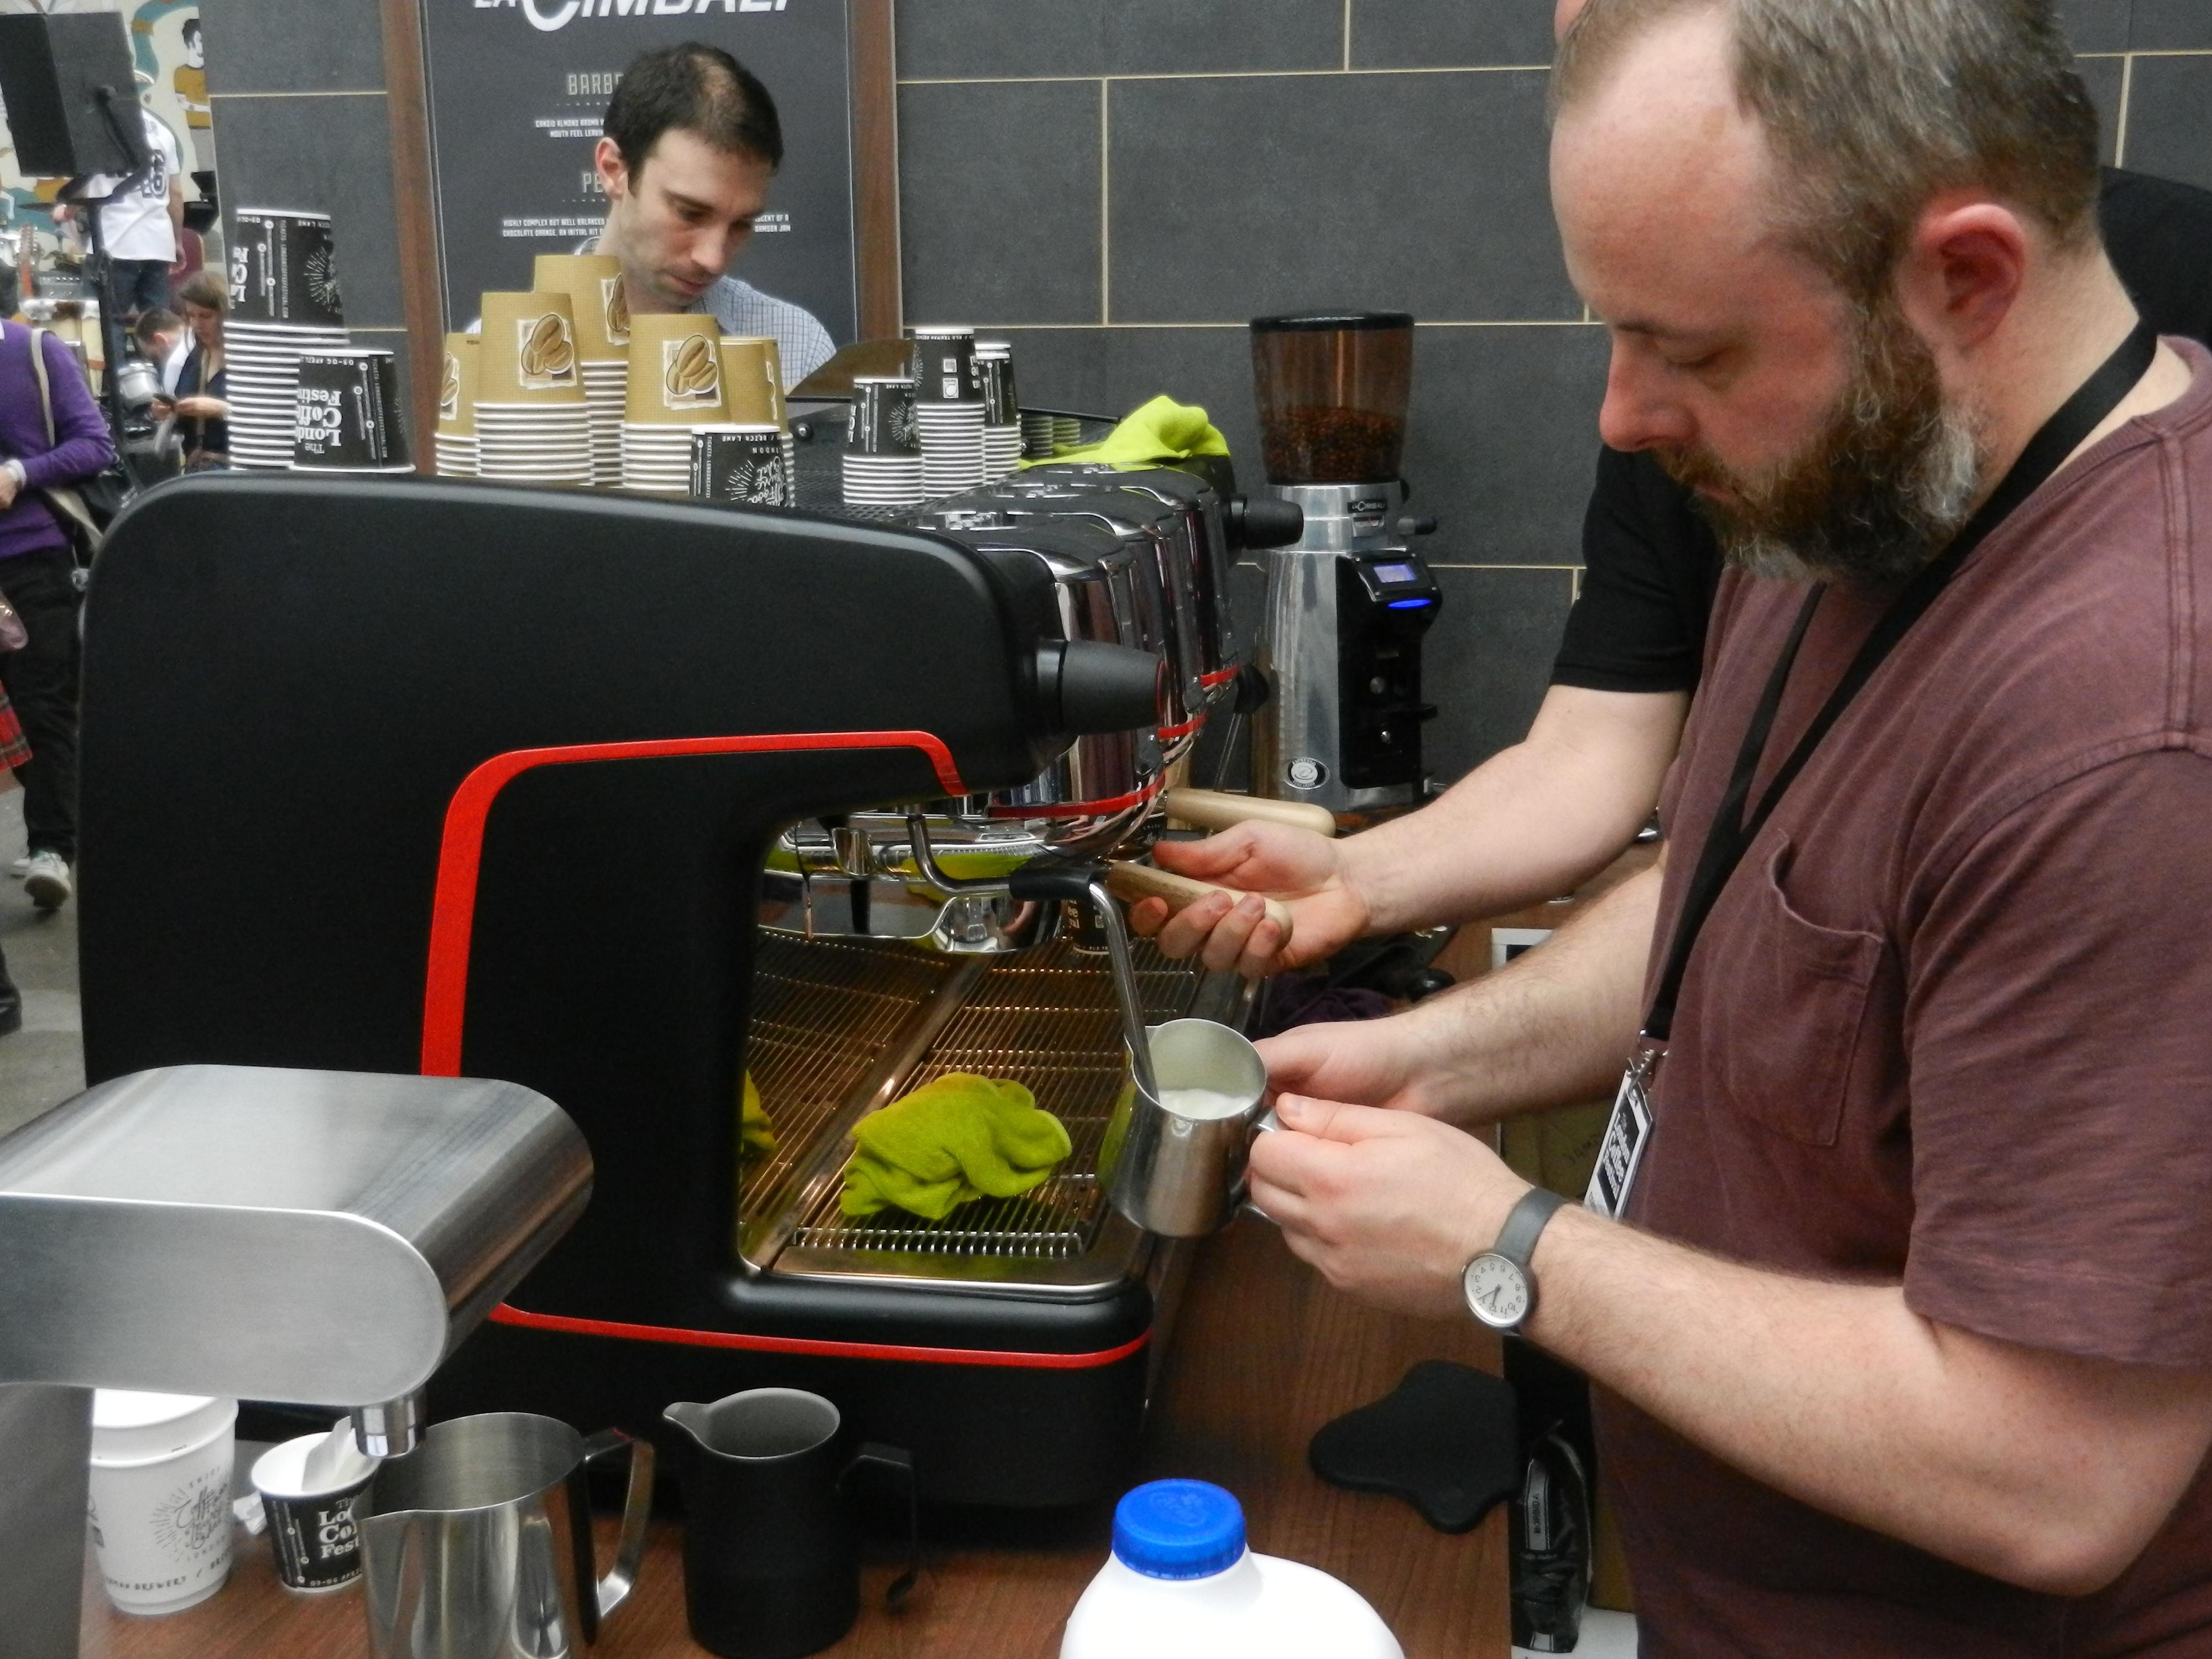 La Cimbali M100 - London Coffee Festival 2014